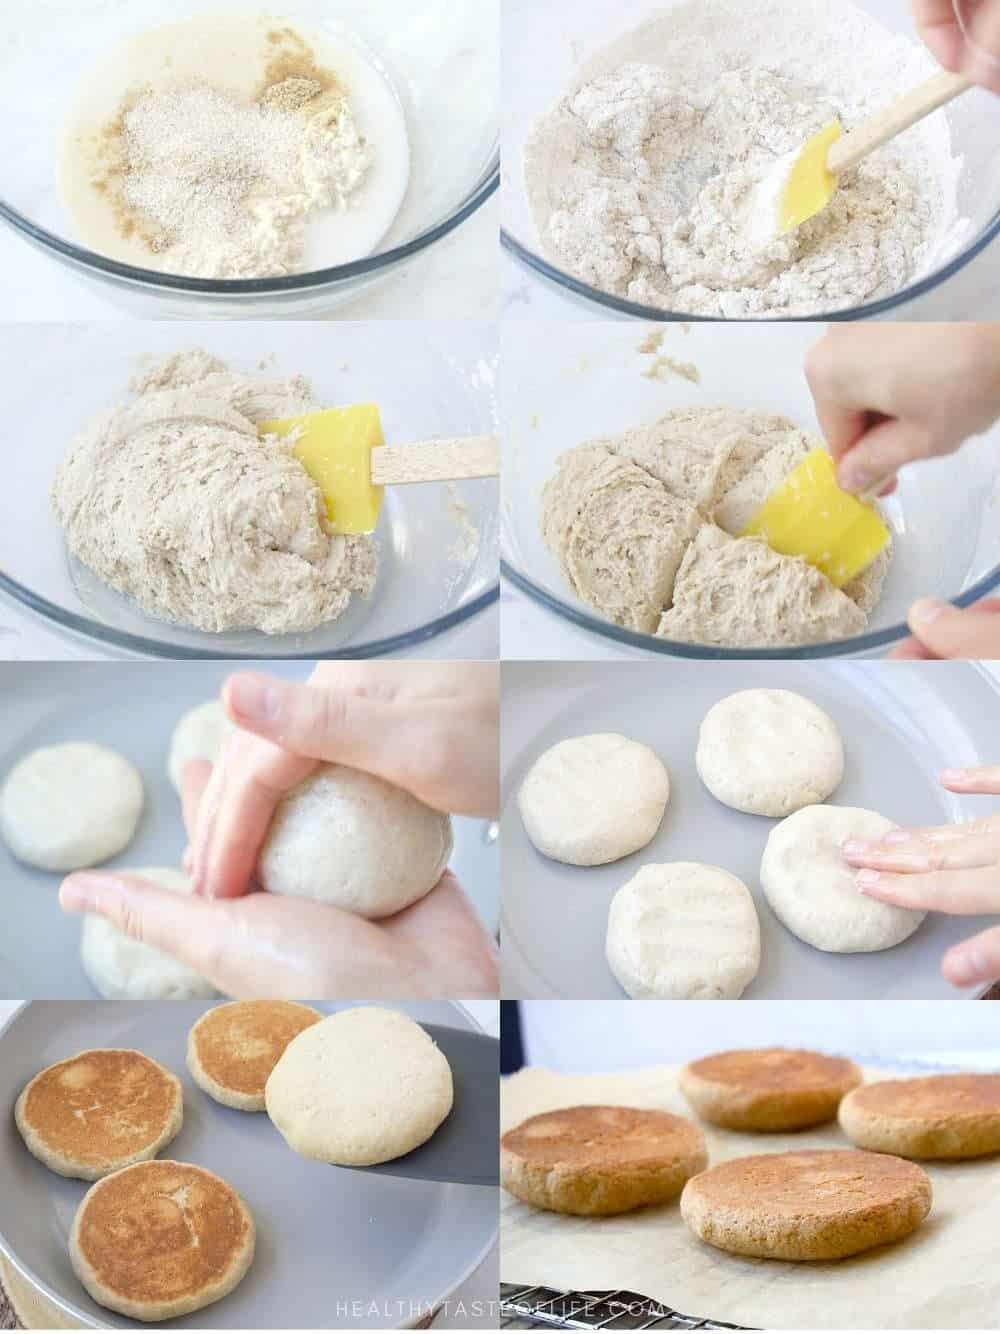 How To Make Vegan Gluten Free English Muffins